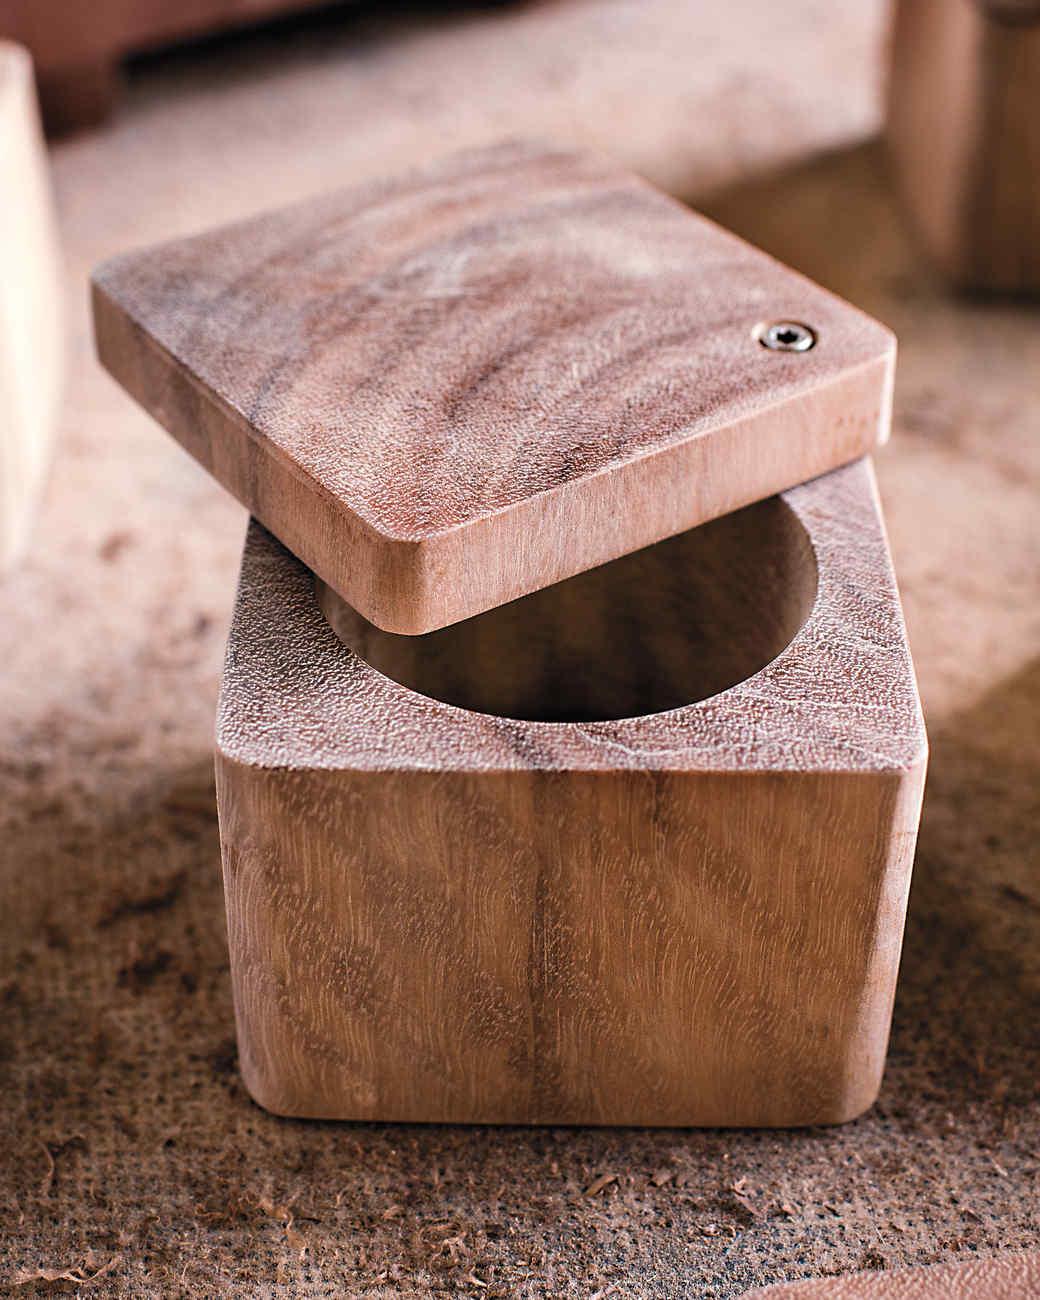 wooden-palate-477-mld110682.jpg